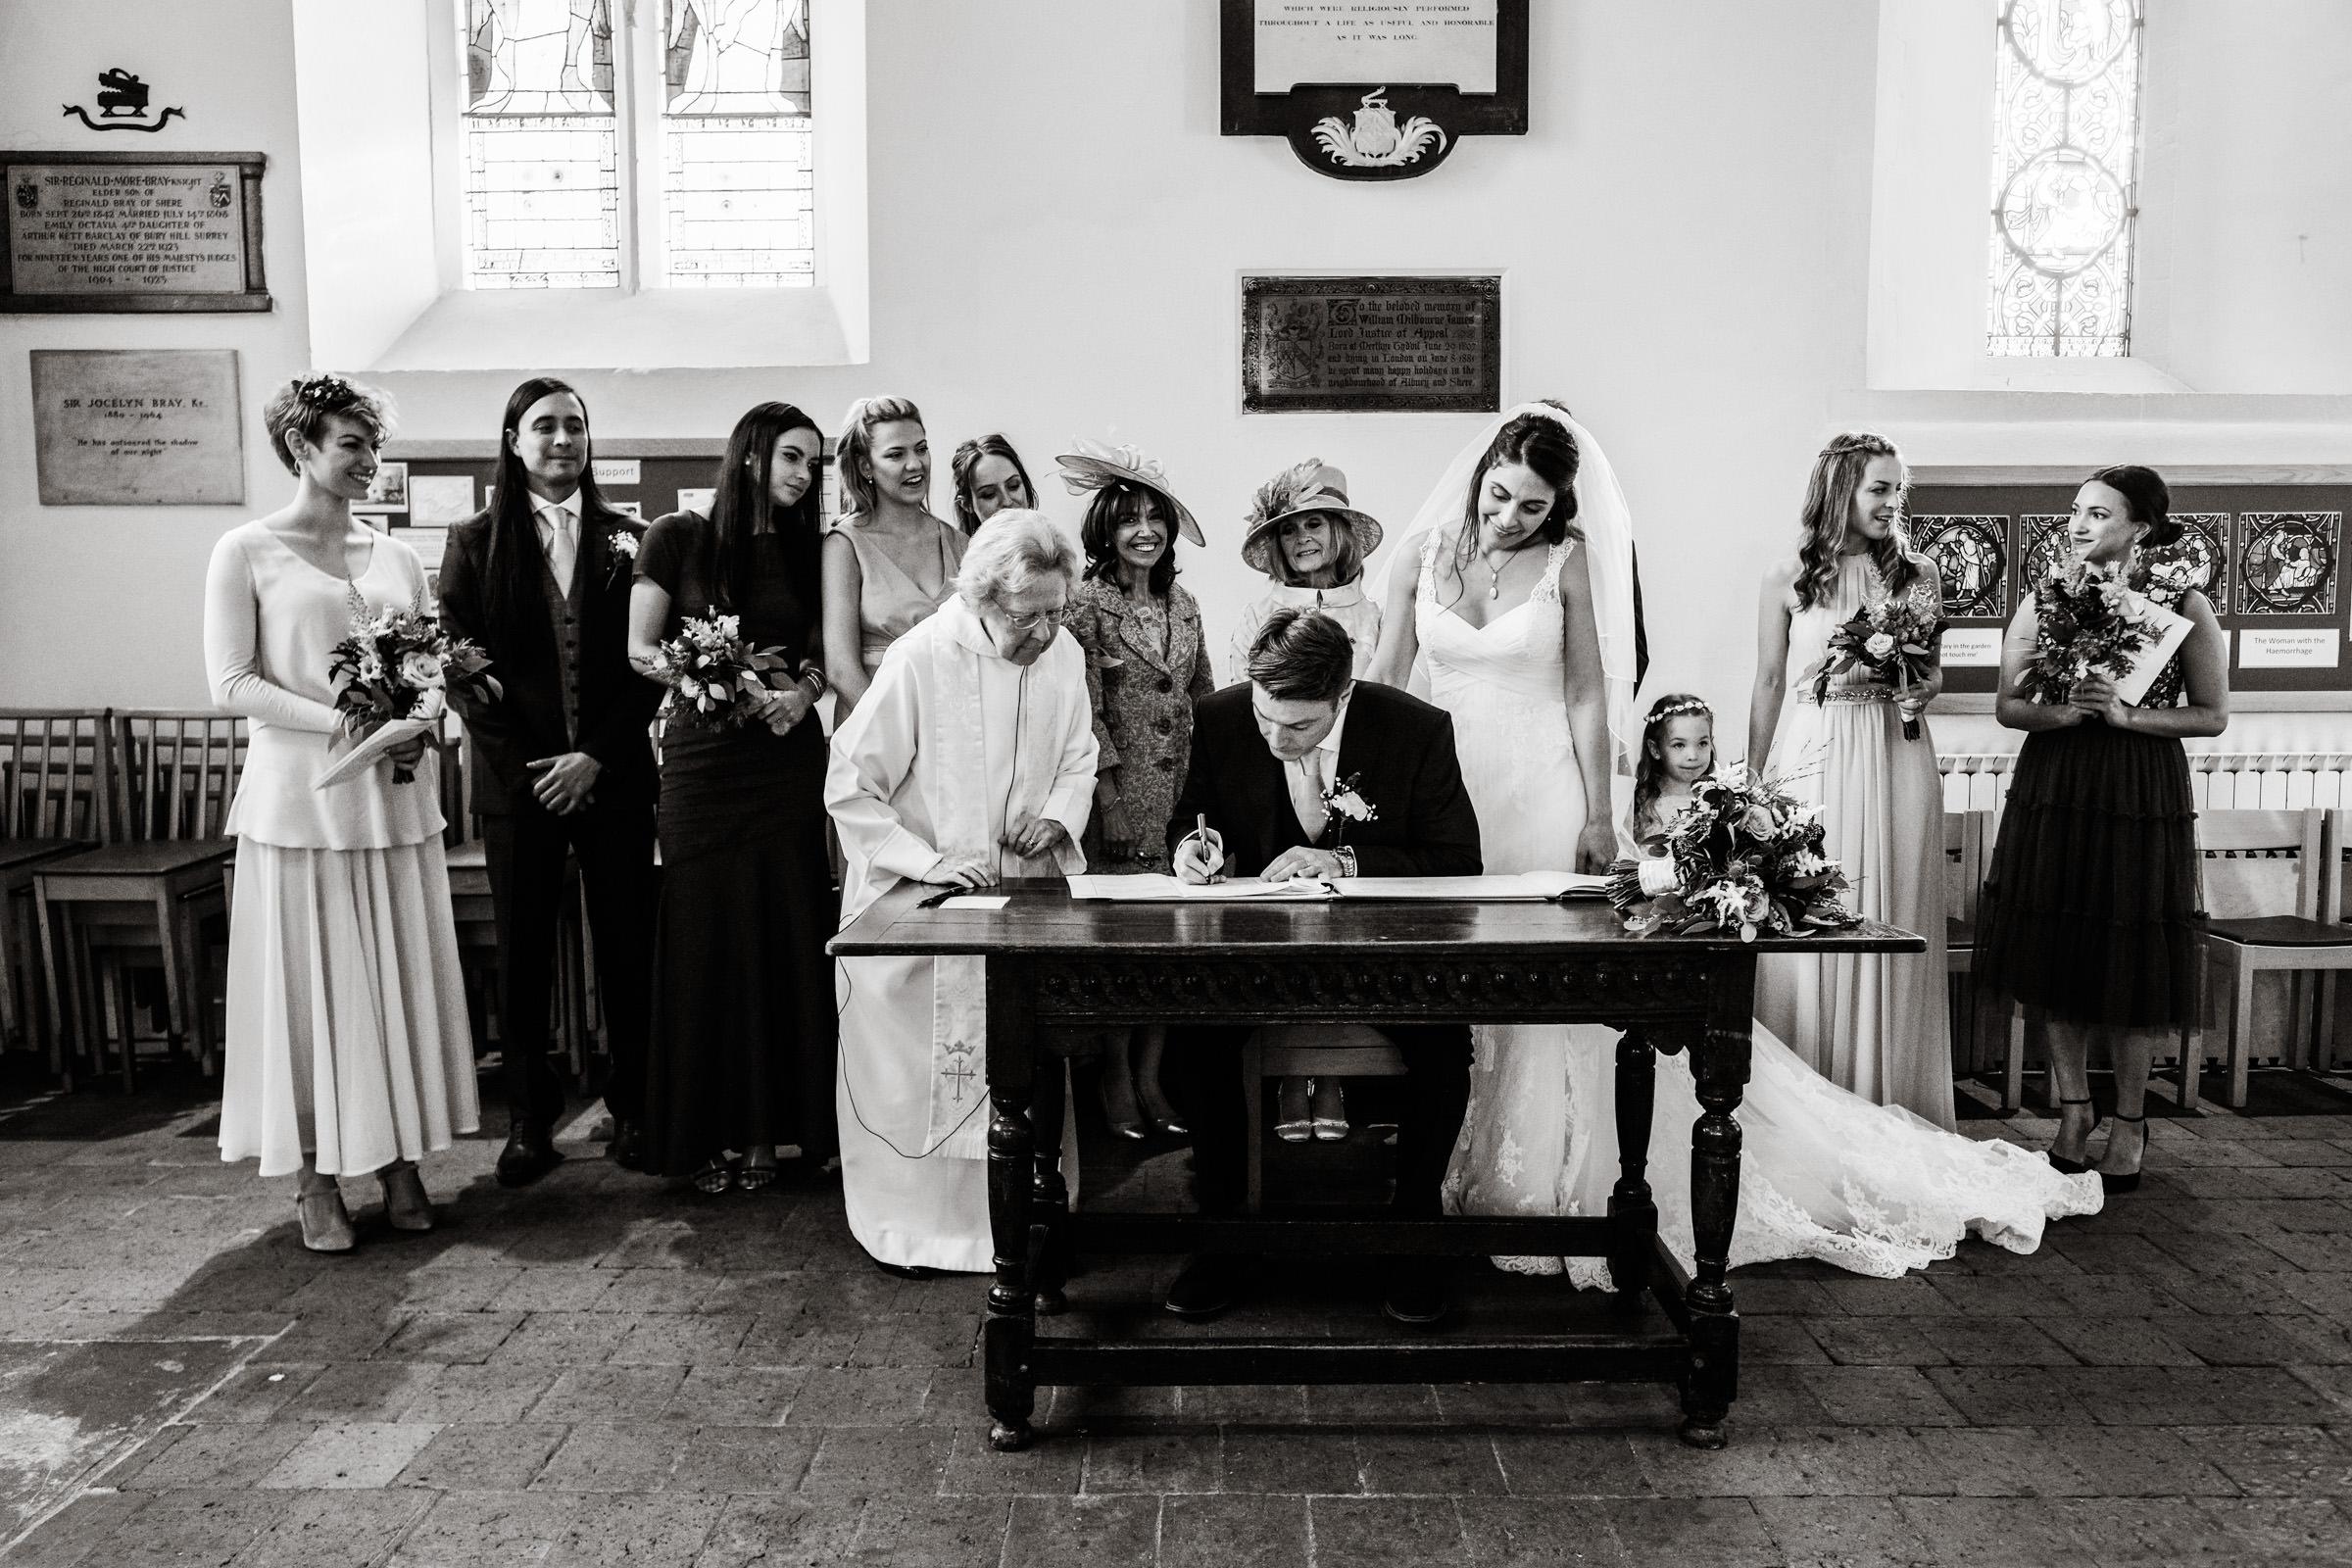 Talbot+Inn+Wedding+Photos+Surrey+013.jpg